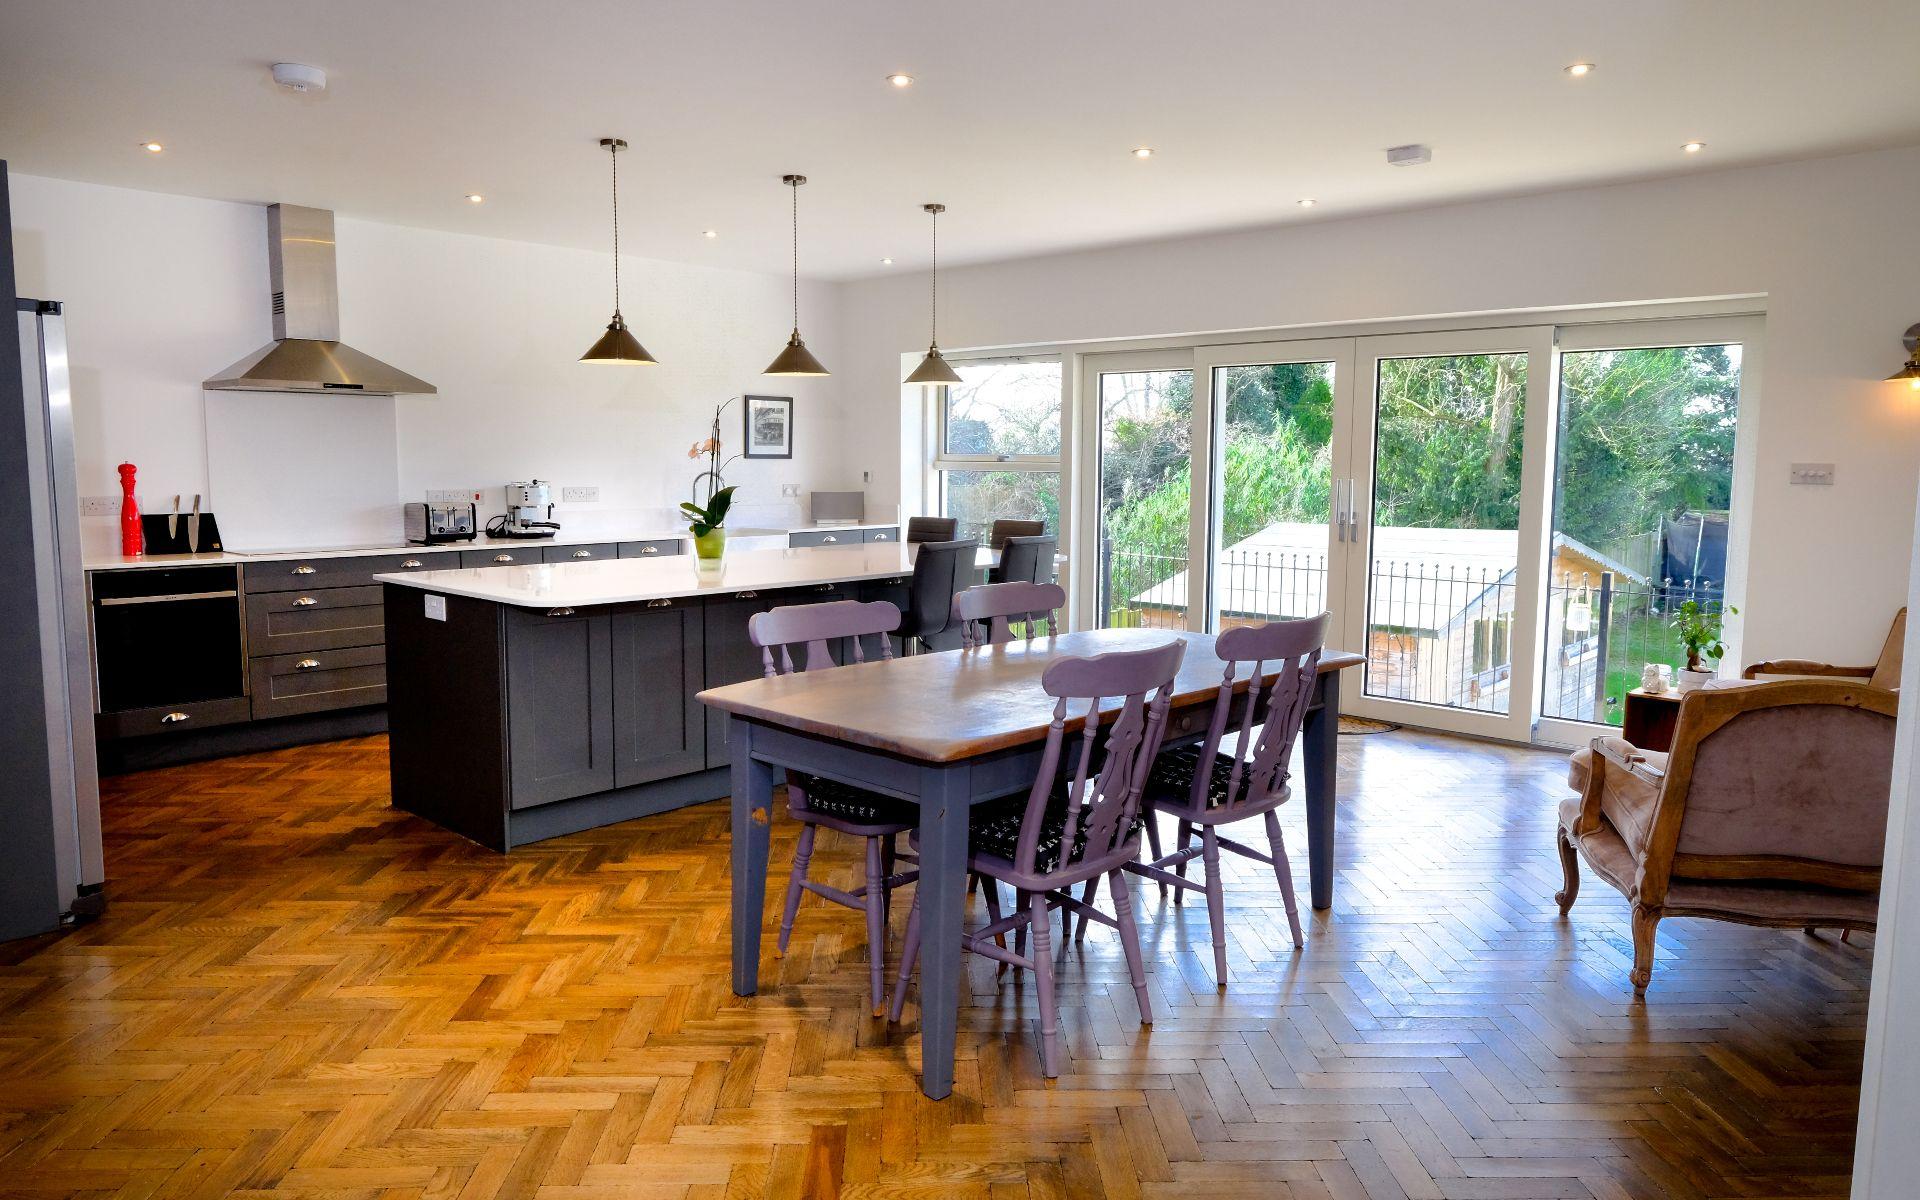 berkshire building project management services refurbishment